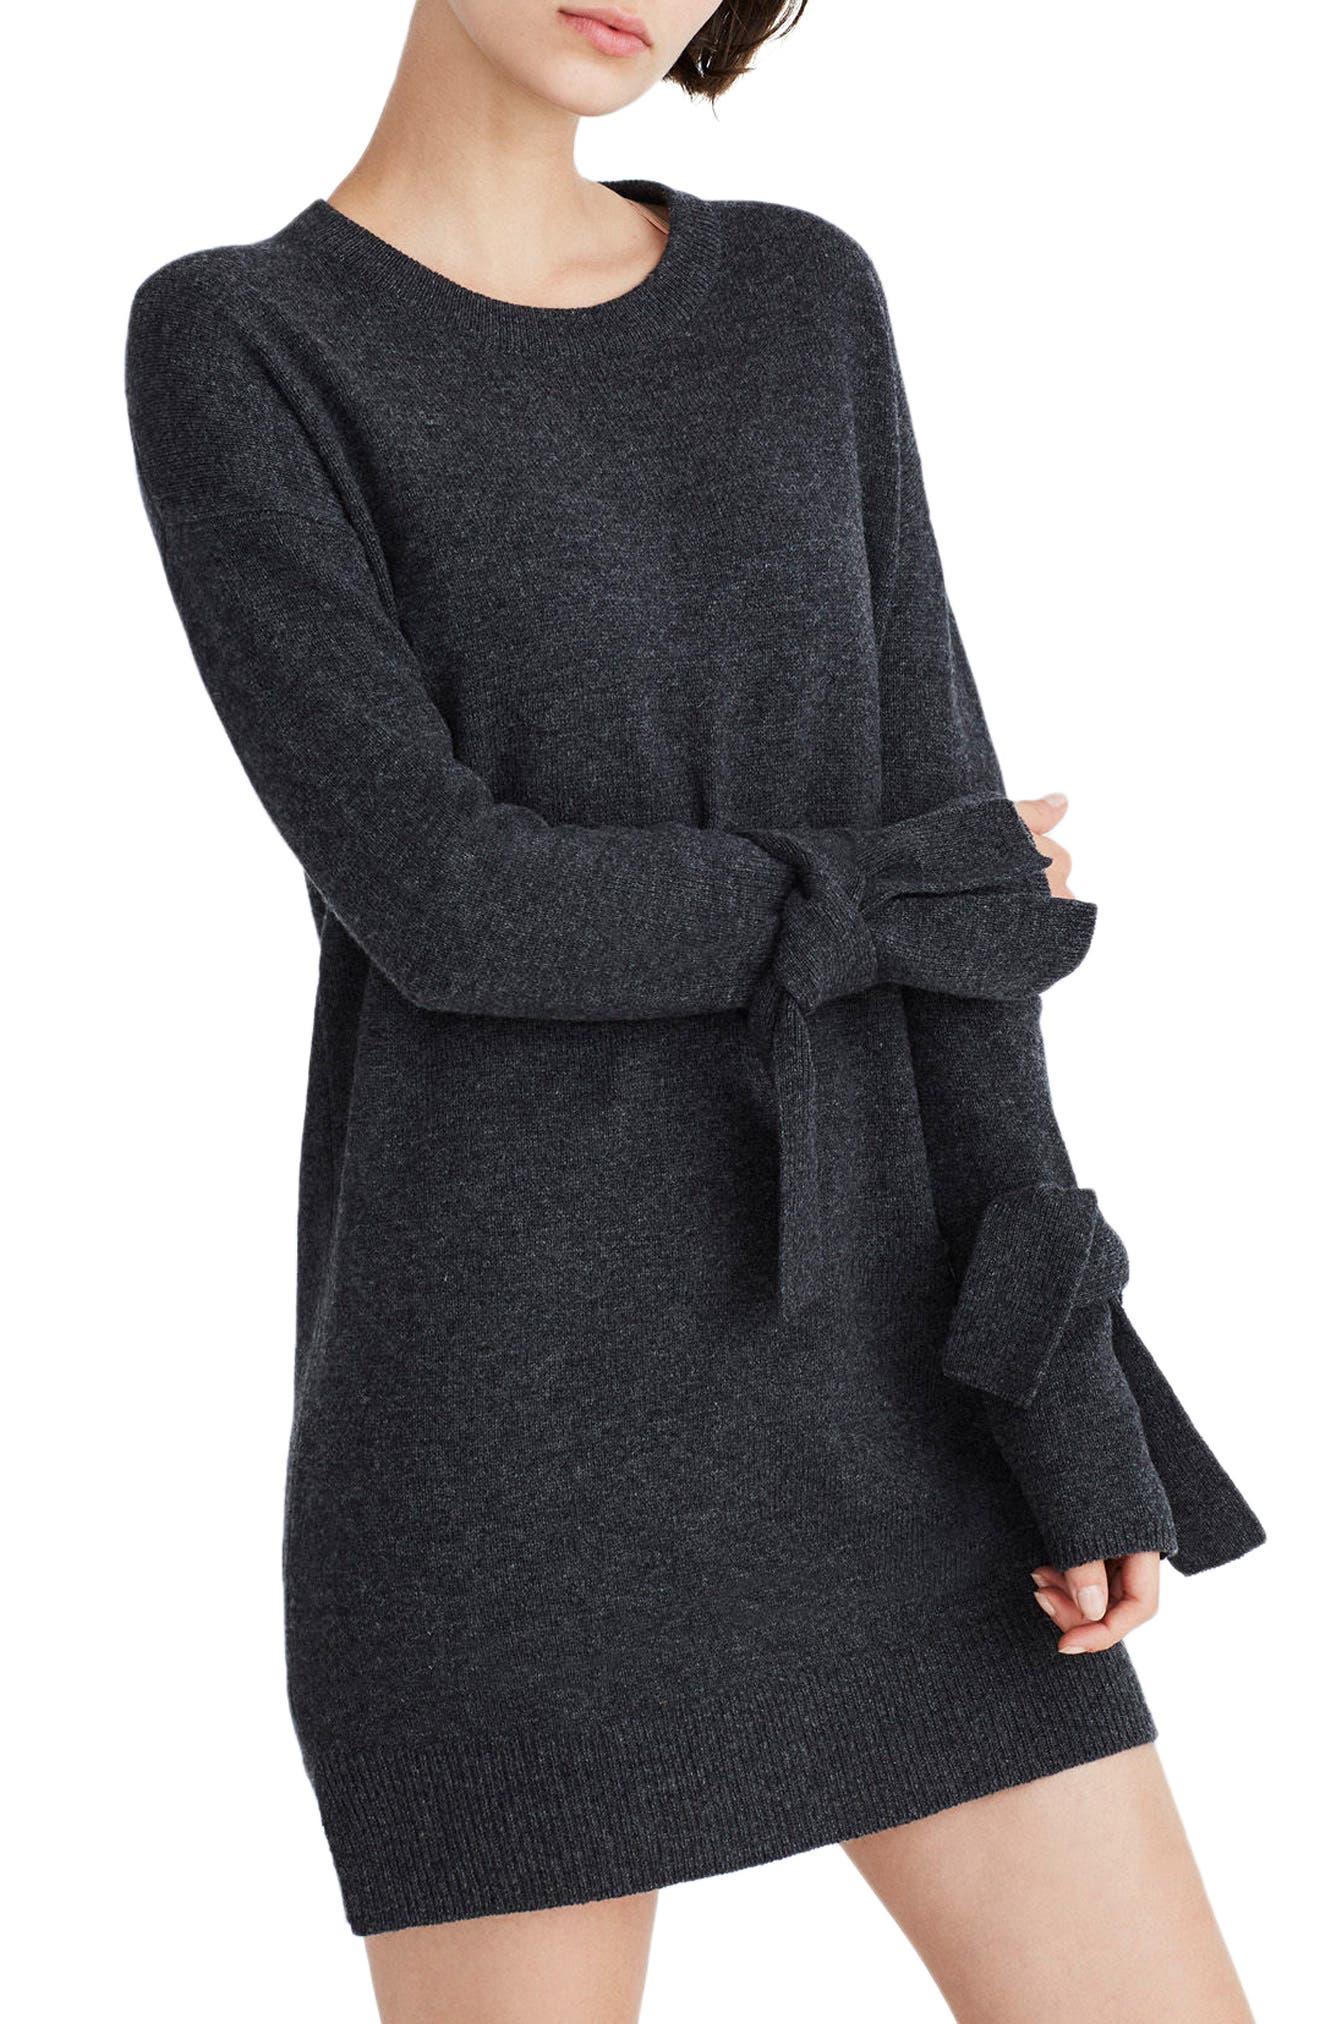 Main Image - Madewell Tie Cuff Sweater Dress